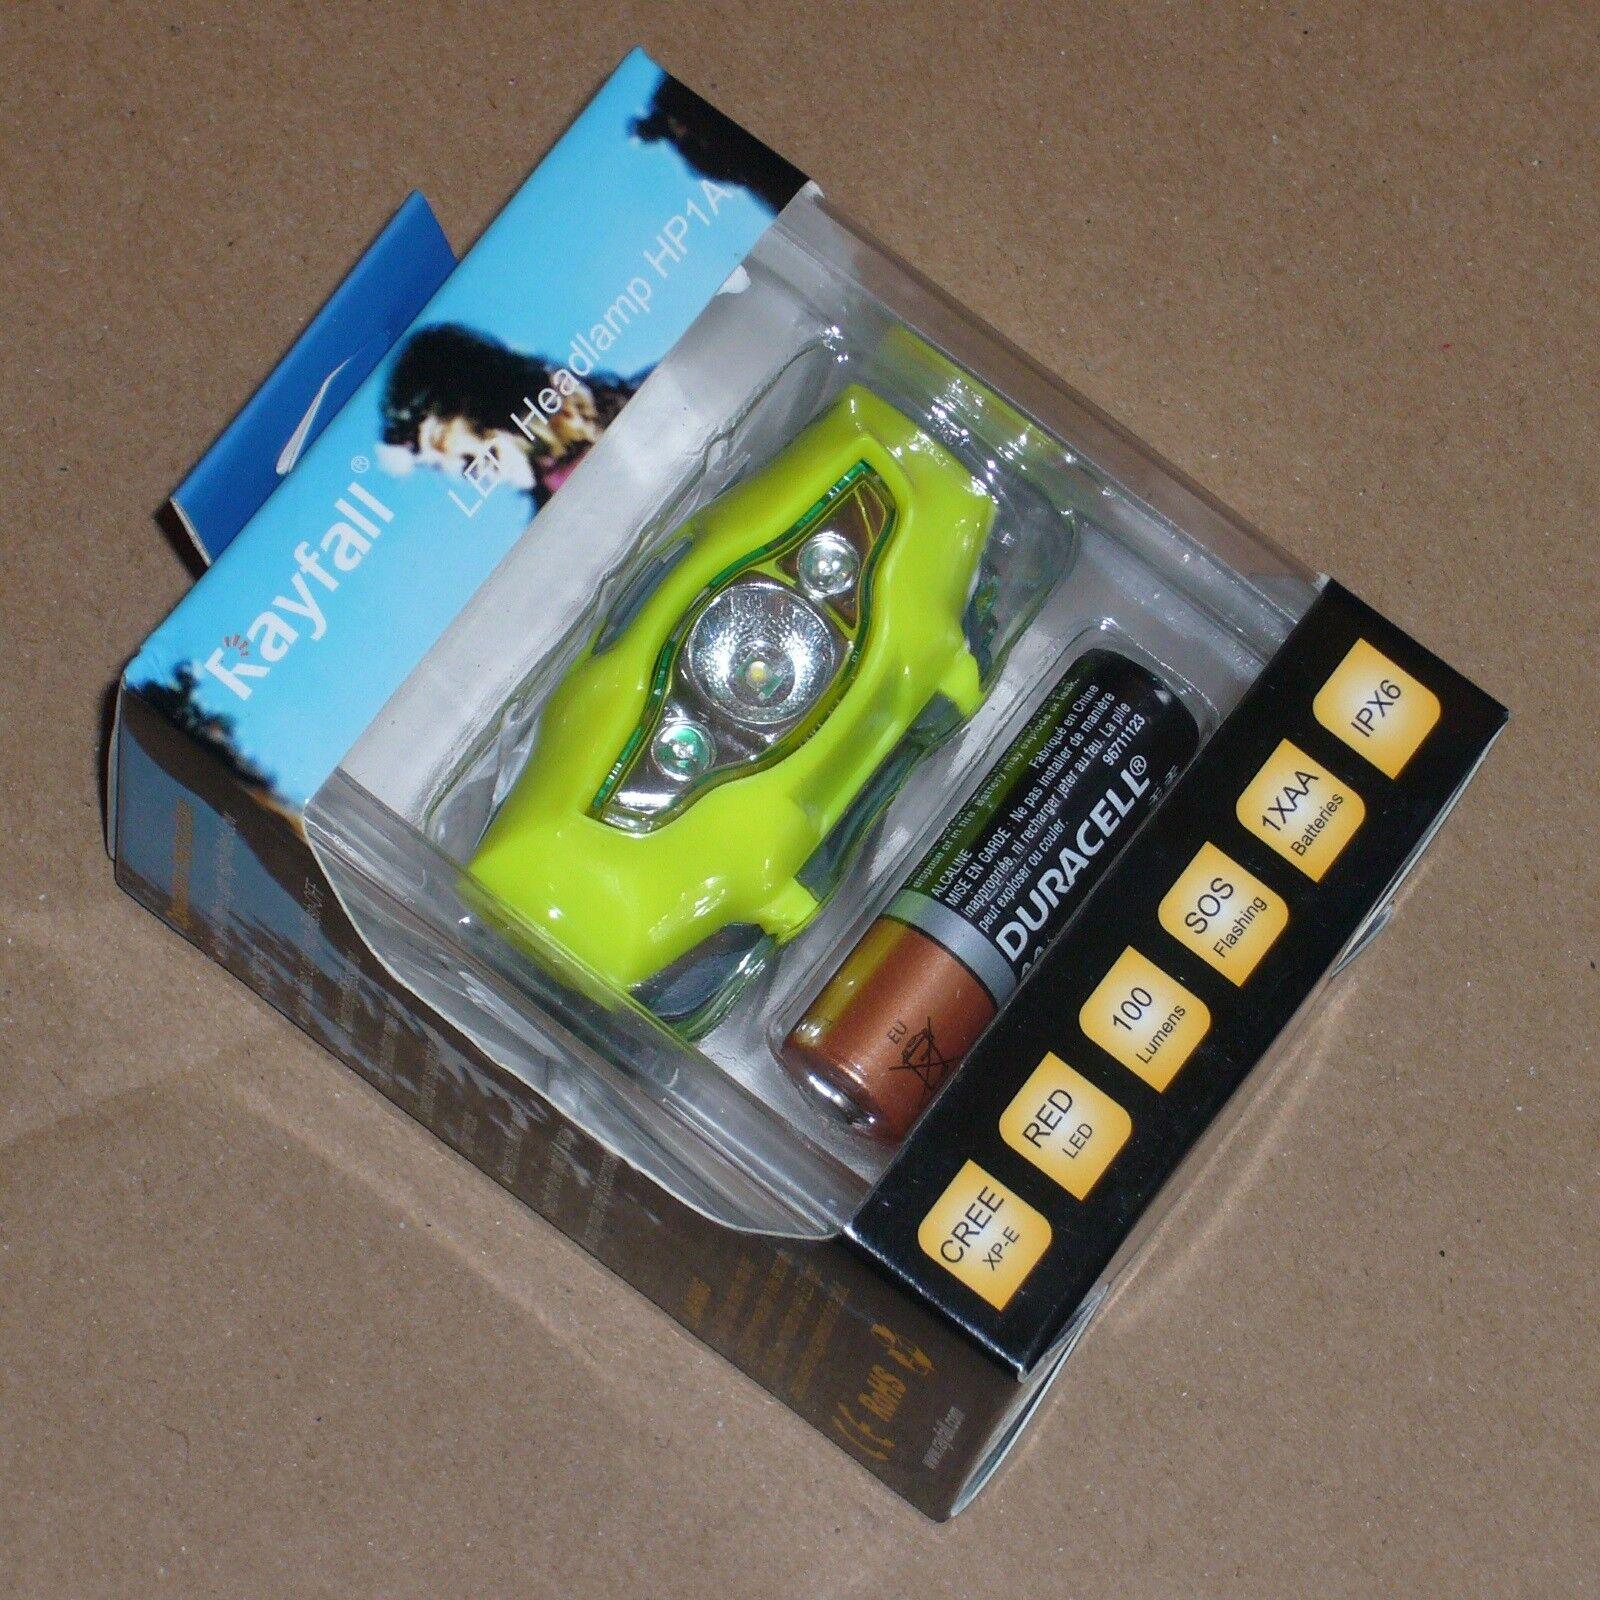 Running Head Torch Hi-Vis - Super-Lightweight (35g) - Super Compact - CREE LED